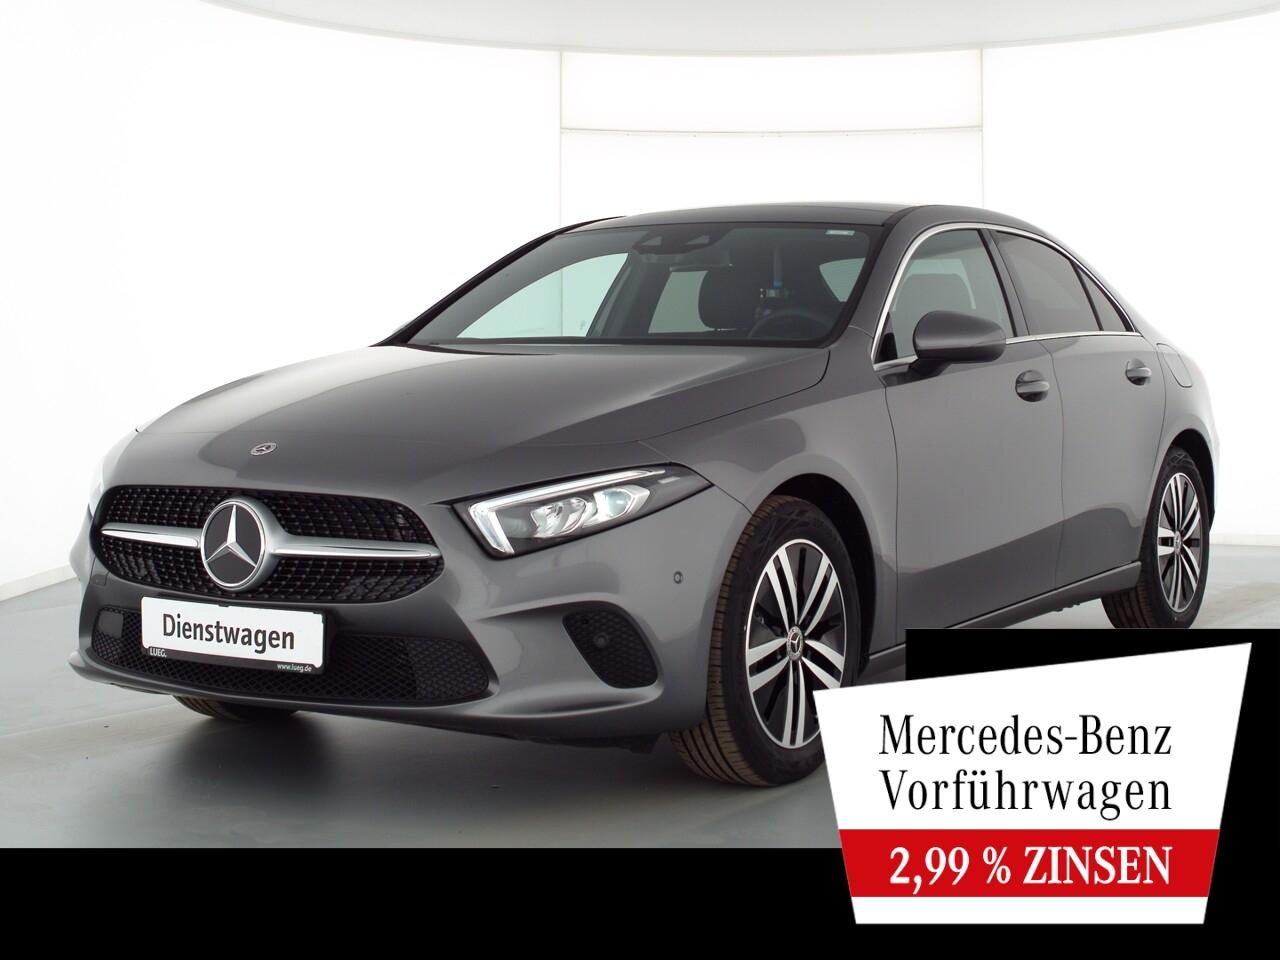 Mercedes-Benz A 180 Lim PROGRESSIVE+PANO+AHK+TOTW+KAMERA+LED, Jahr 2021, Benzin